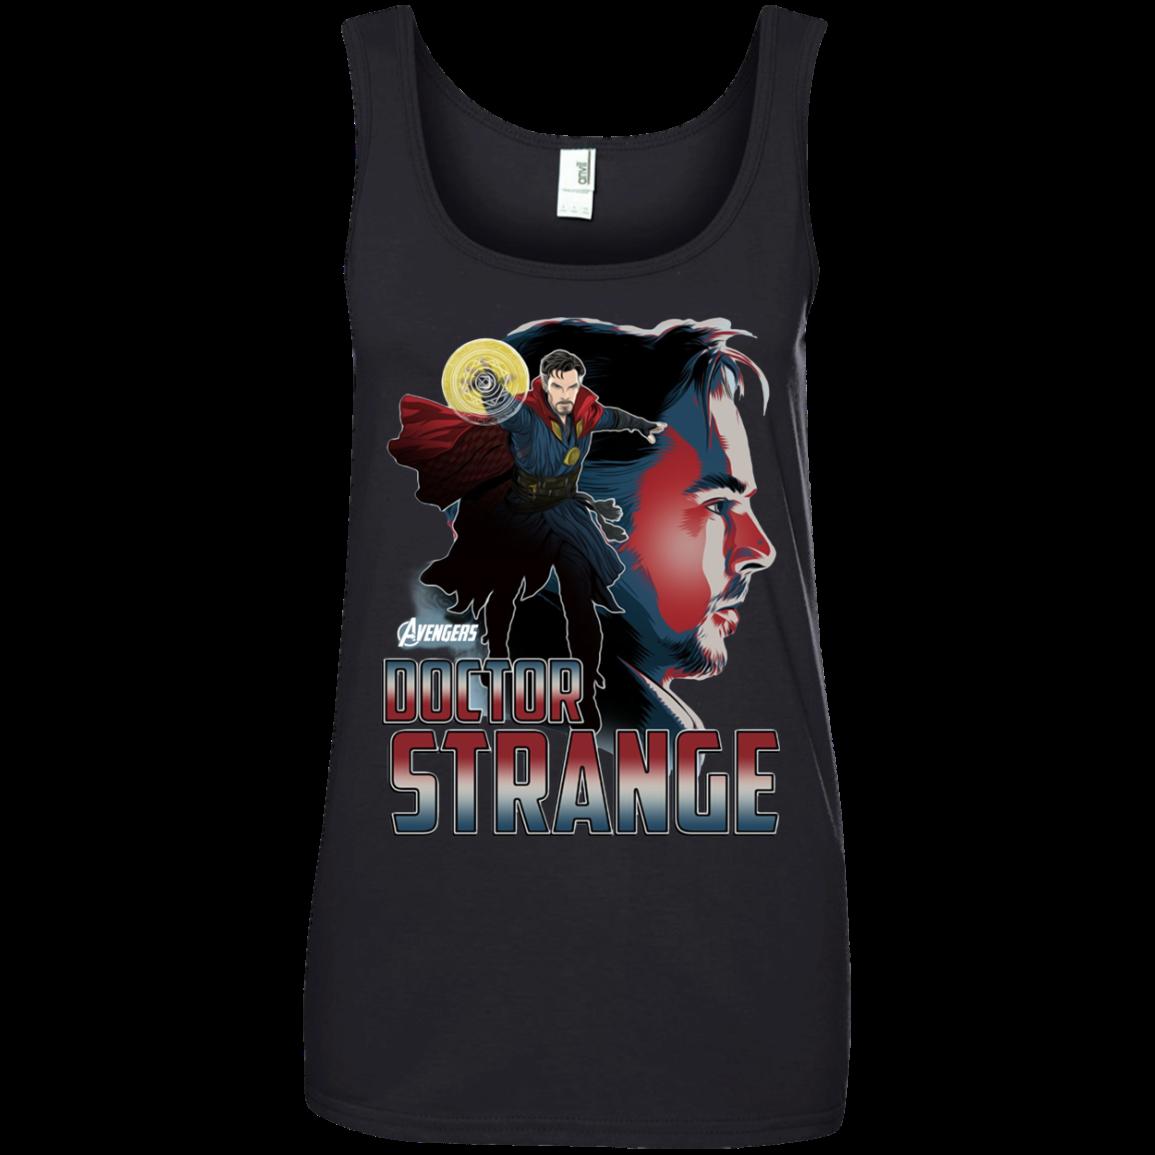 Avengers Infinity War Doctor Strange Head T shirt Hoodie Sweater Tank Top 882